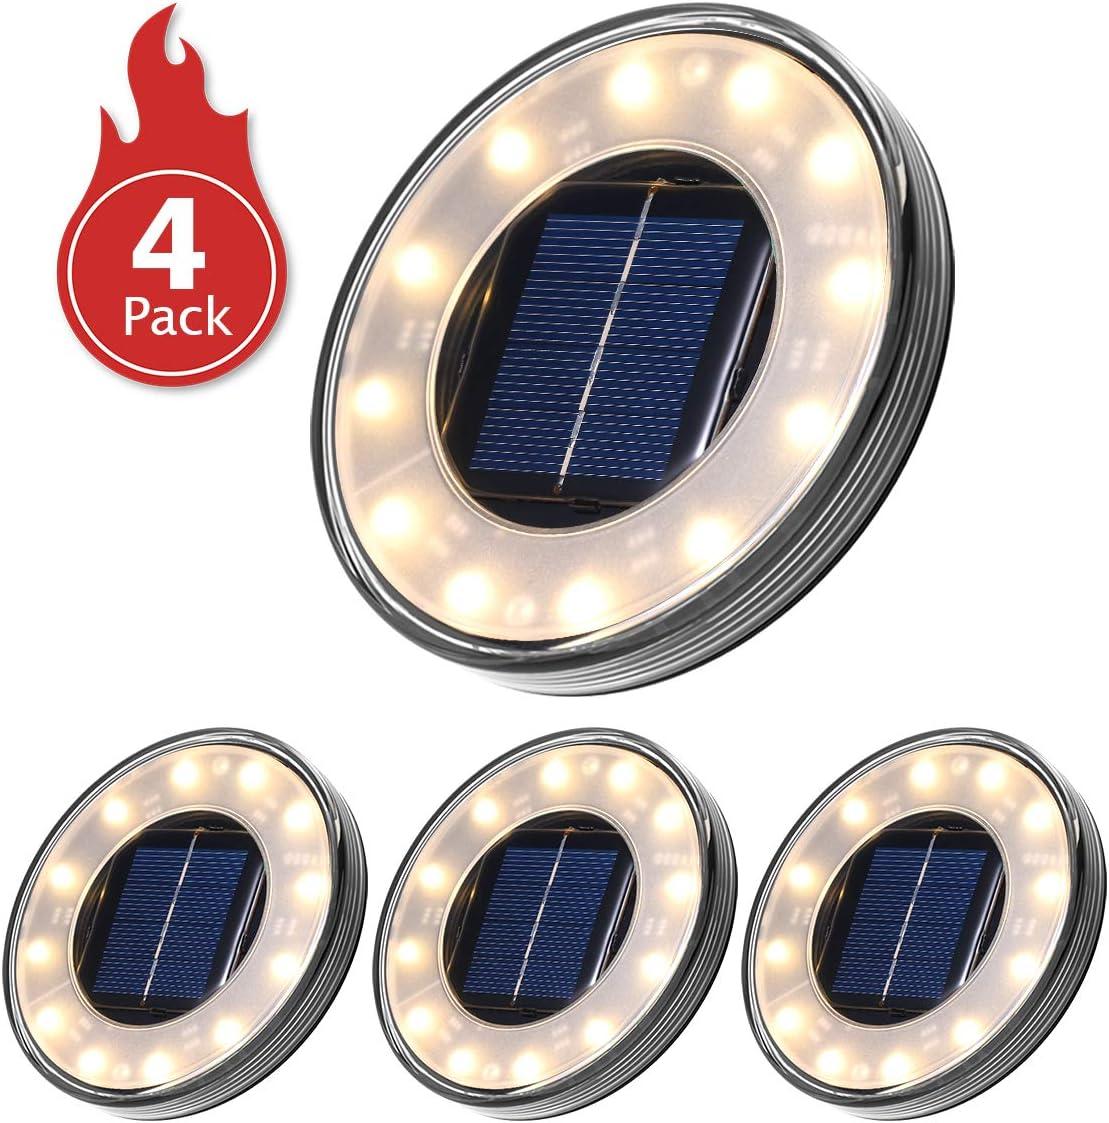 Luces Solares Led Exterior,Tomshine 4 Pack 12 LEDs Luces Solares para Jardín,IP68 Impermeable,Focos Solares LED para Exterior, Jardín, Terraza, Césped, Pasarela(Blanco Cálido): Amazon.es: Iluminación